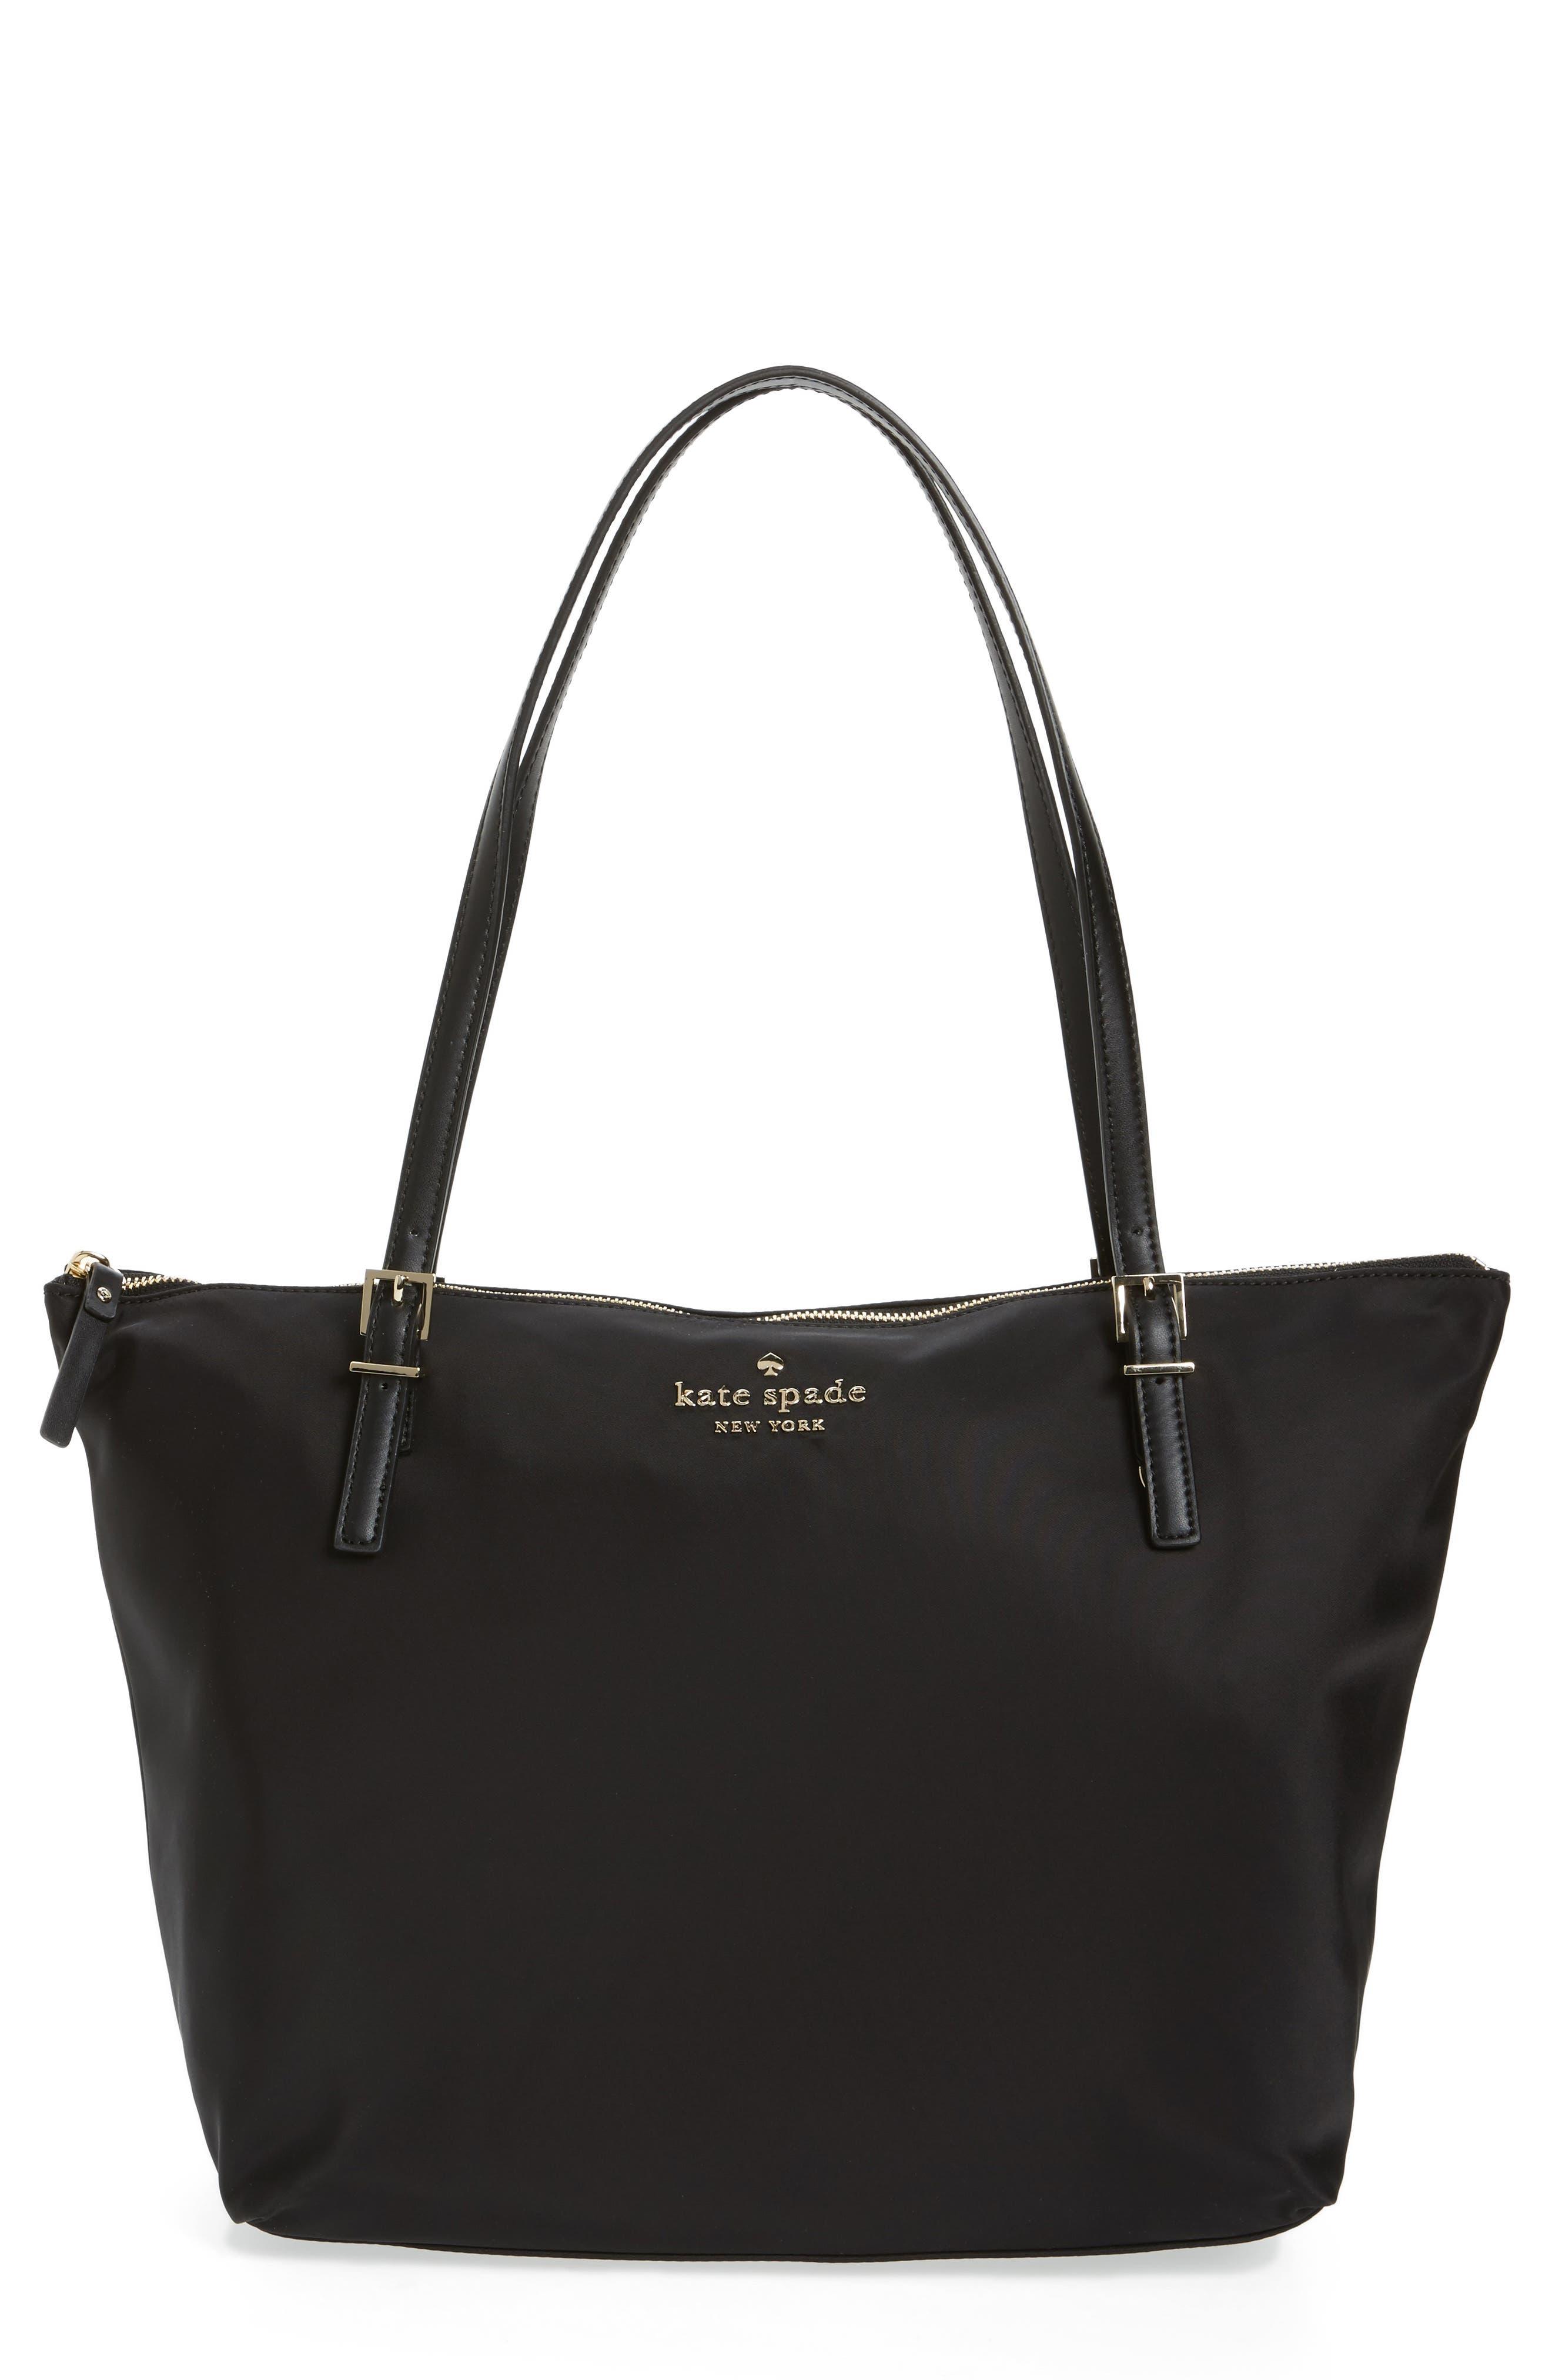 6ff897f1c5 kate spade handbags